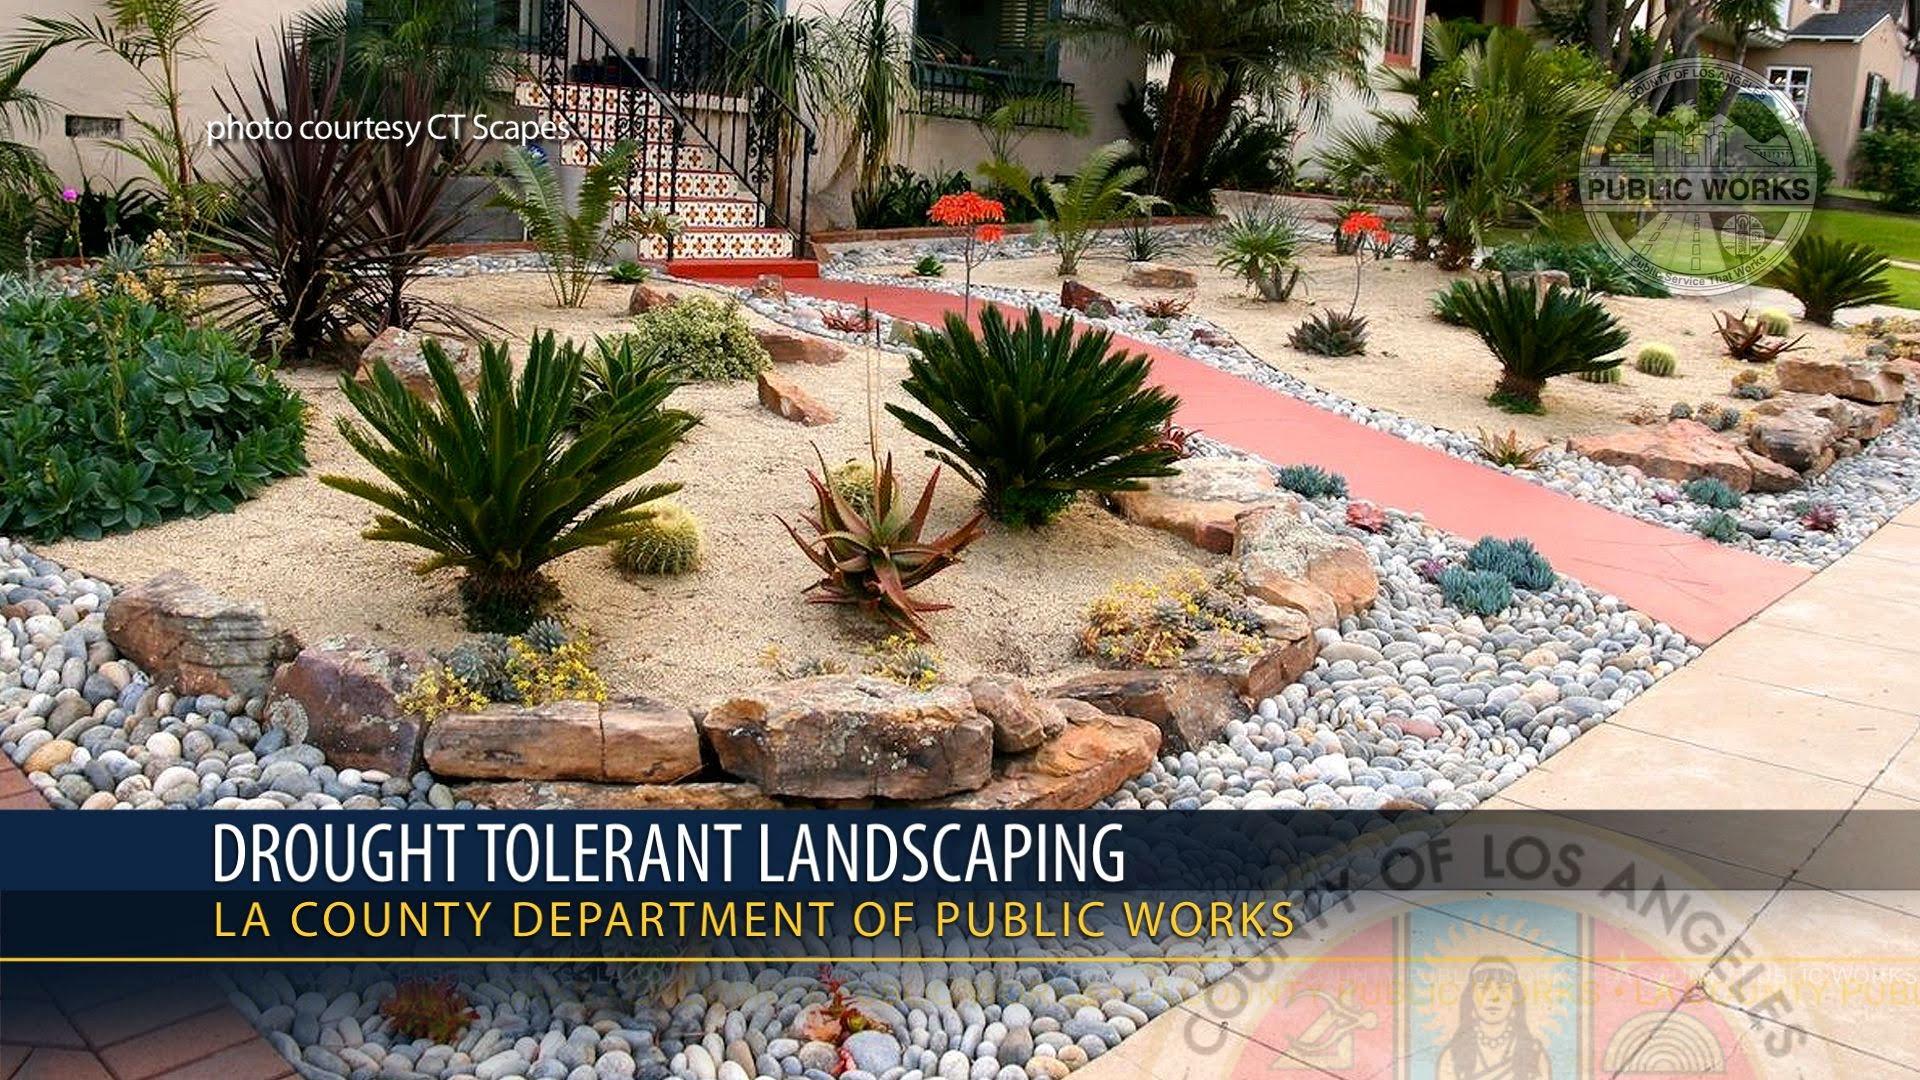 drought resistant landscaping psa - drought tolerant landscaping - youtube YLDZCSG